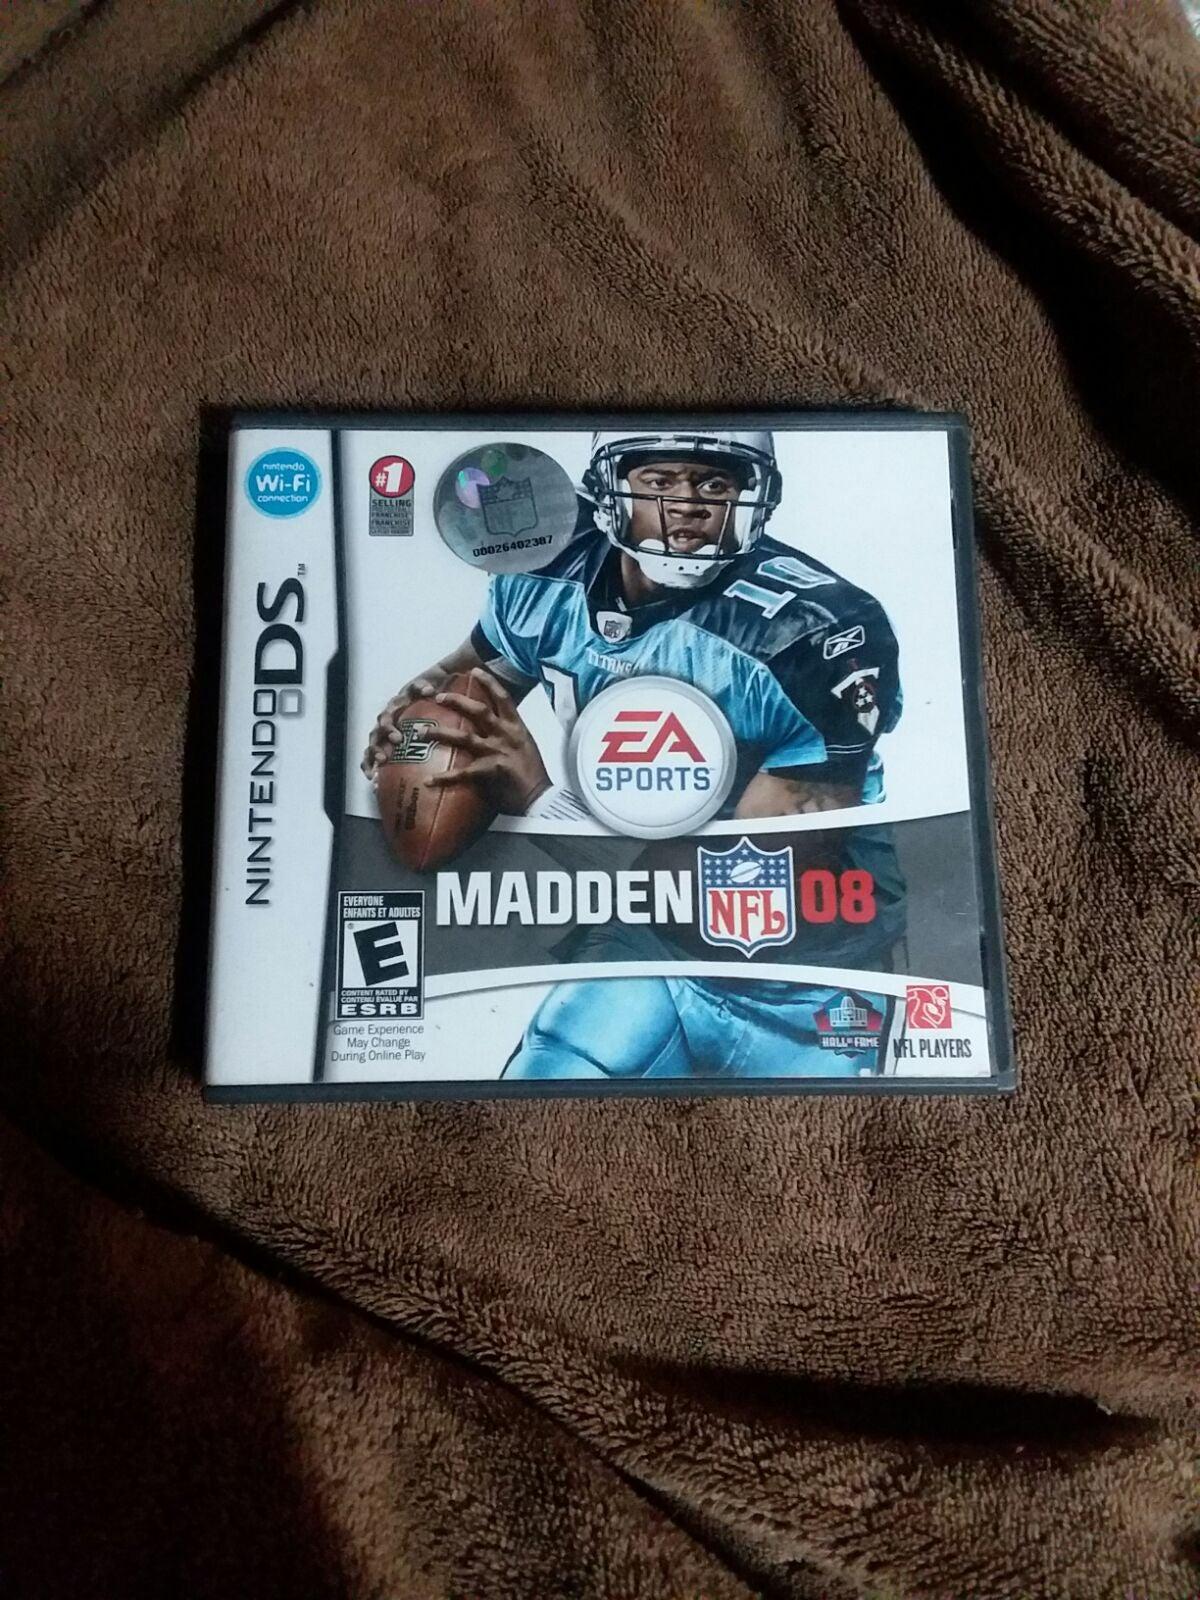 Madden 08 Nintendo DS